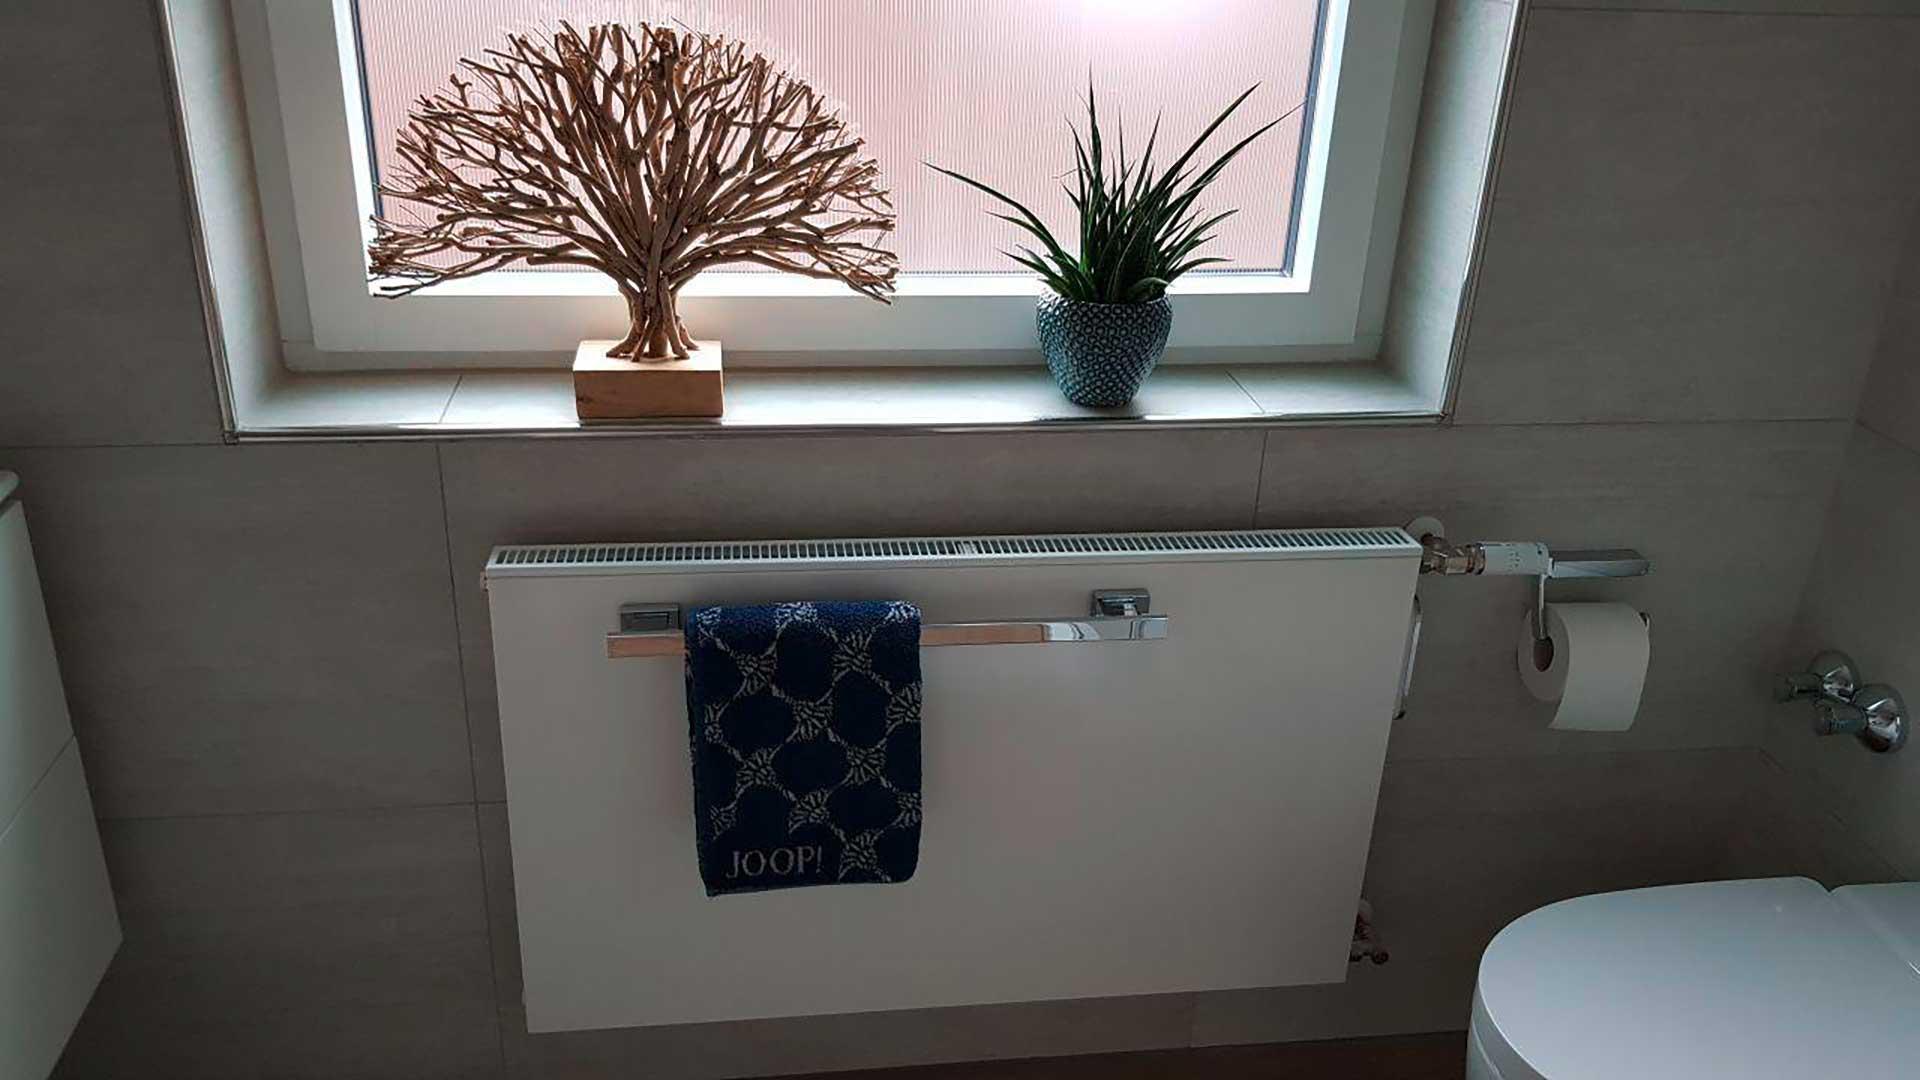 Vest Haustechnik - Badsanierung in Dorsten